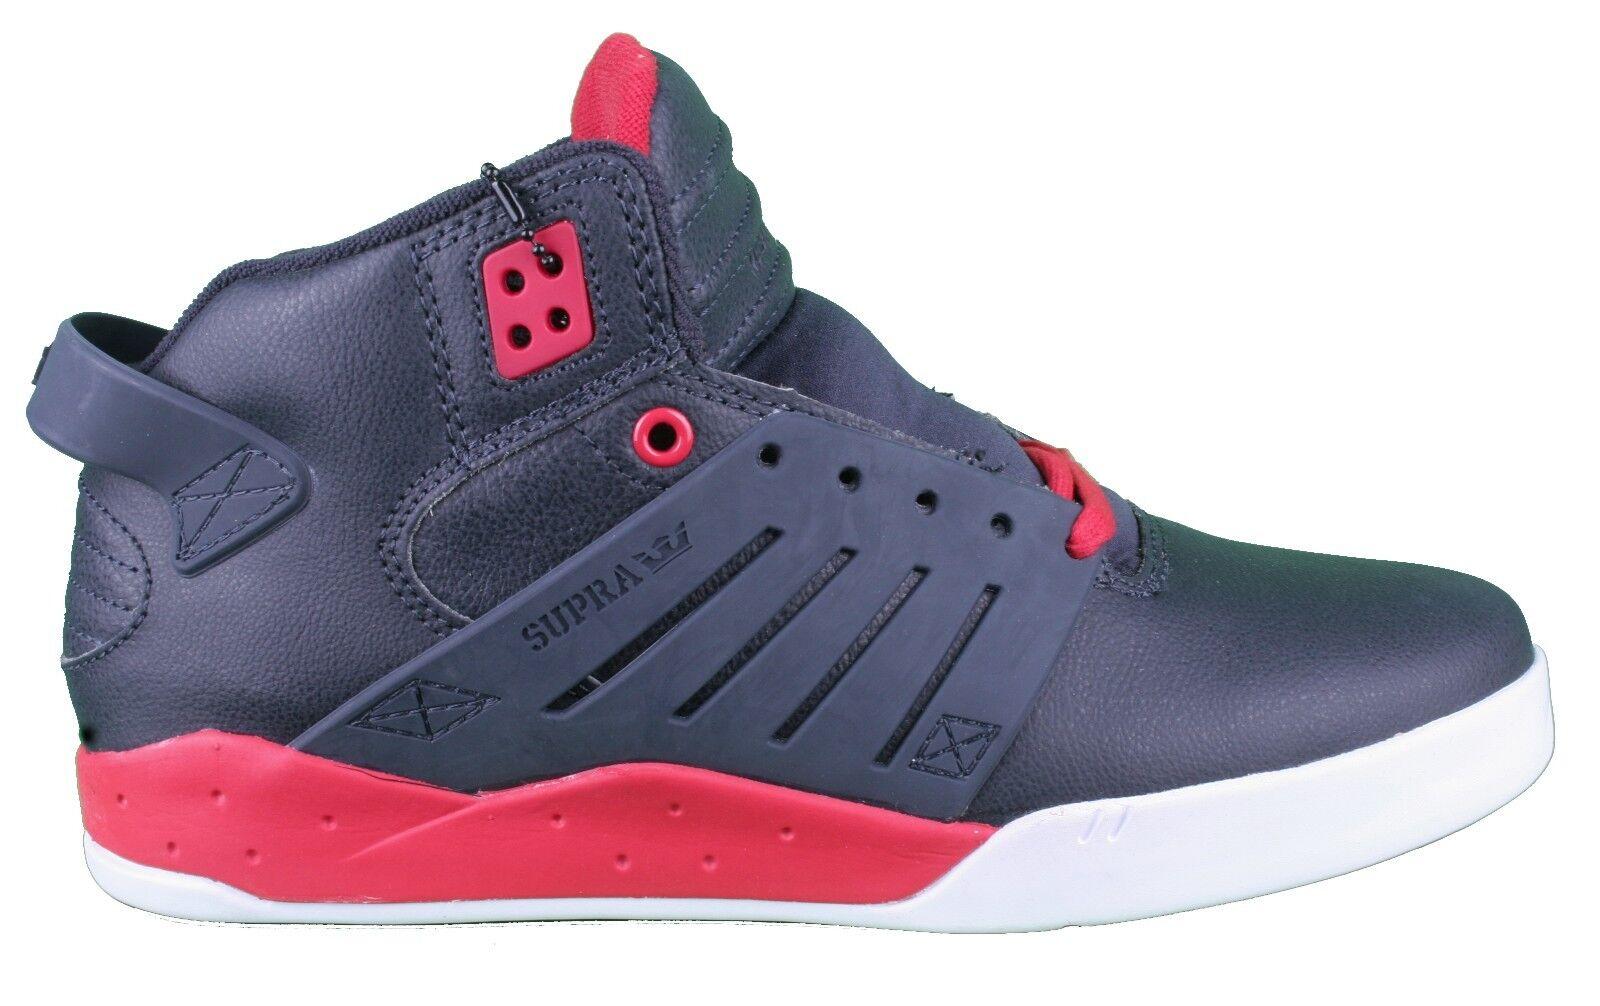 Supra Skytop Skytop Supra III Midnight/White/Red Mid Top Skateboarding Shoes  9.5 NIB 2b7f3c